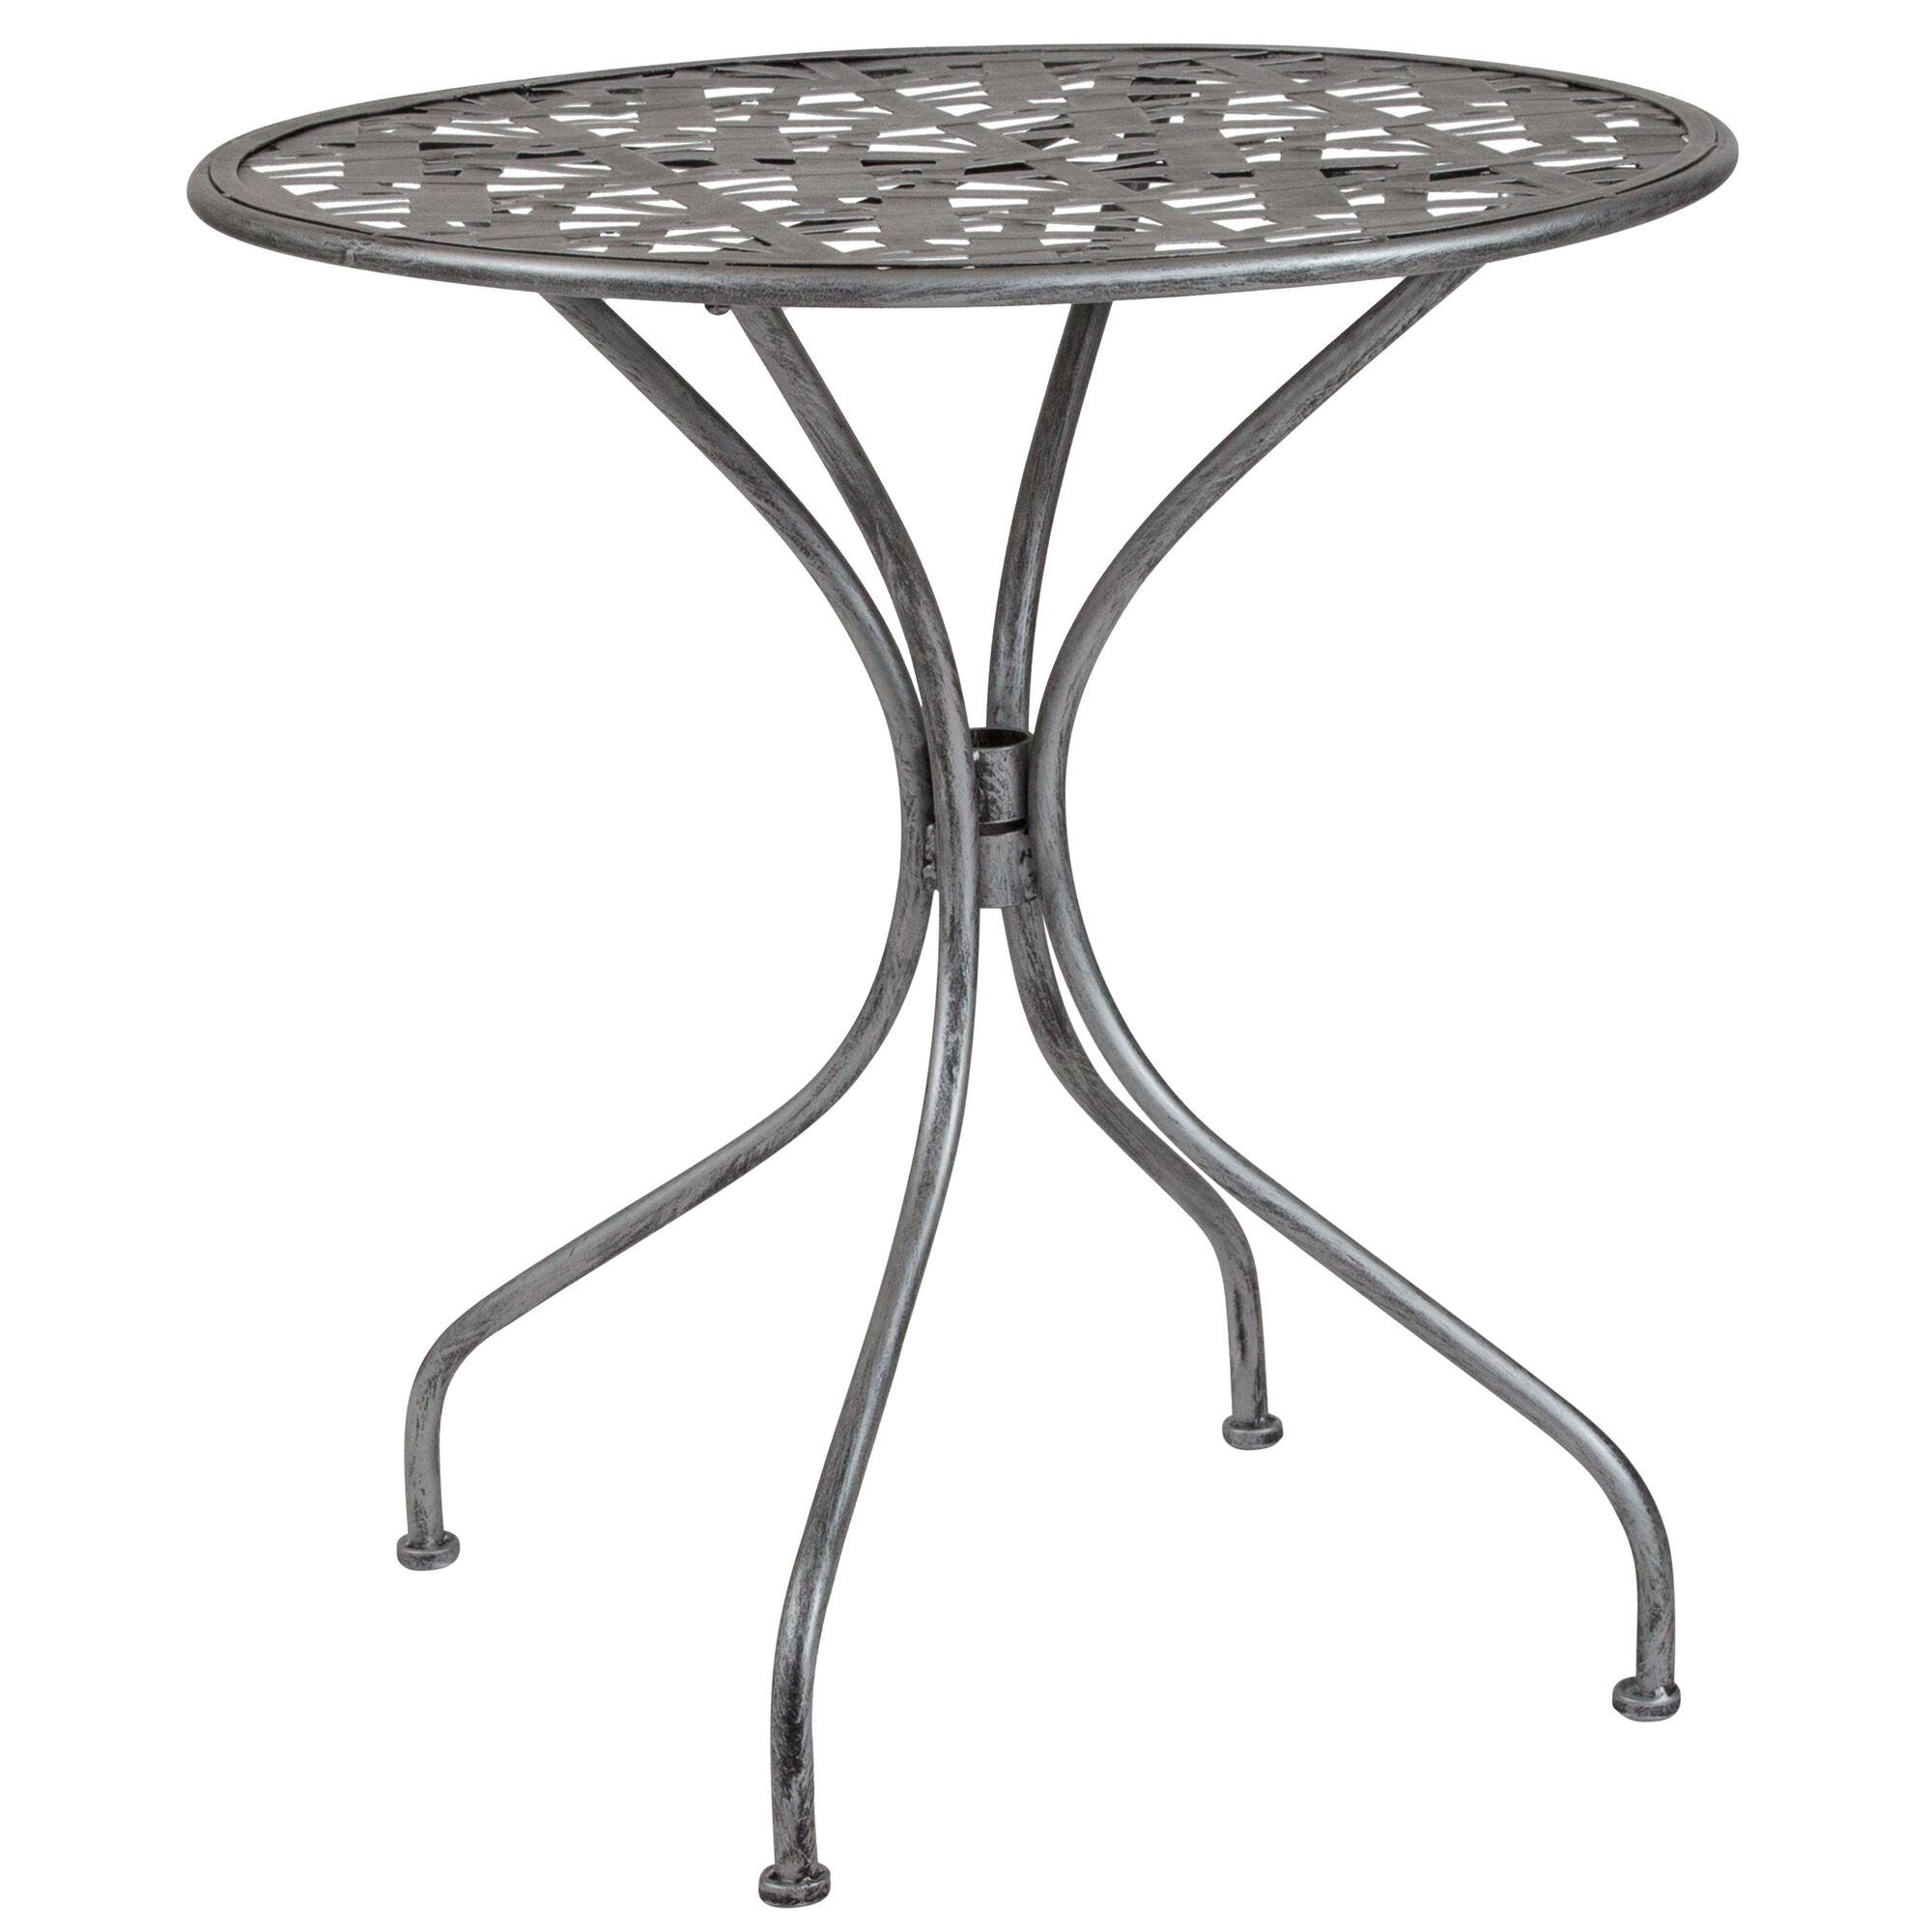 Silver Patio Furniture.Agostina Series 27 5 Round Antique Silver Indoor Outdoor Steel Patio Table